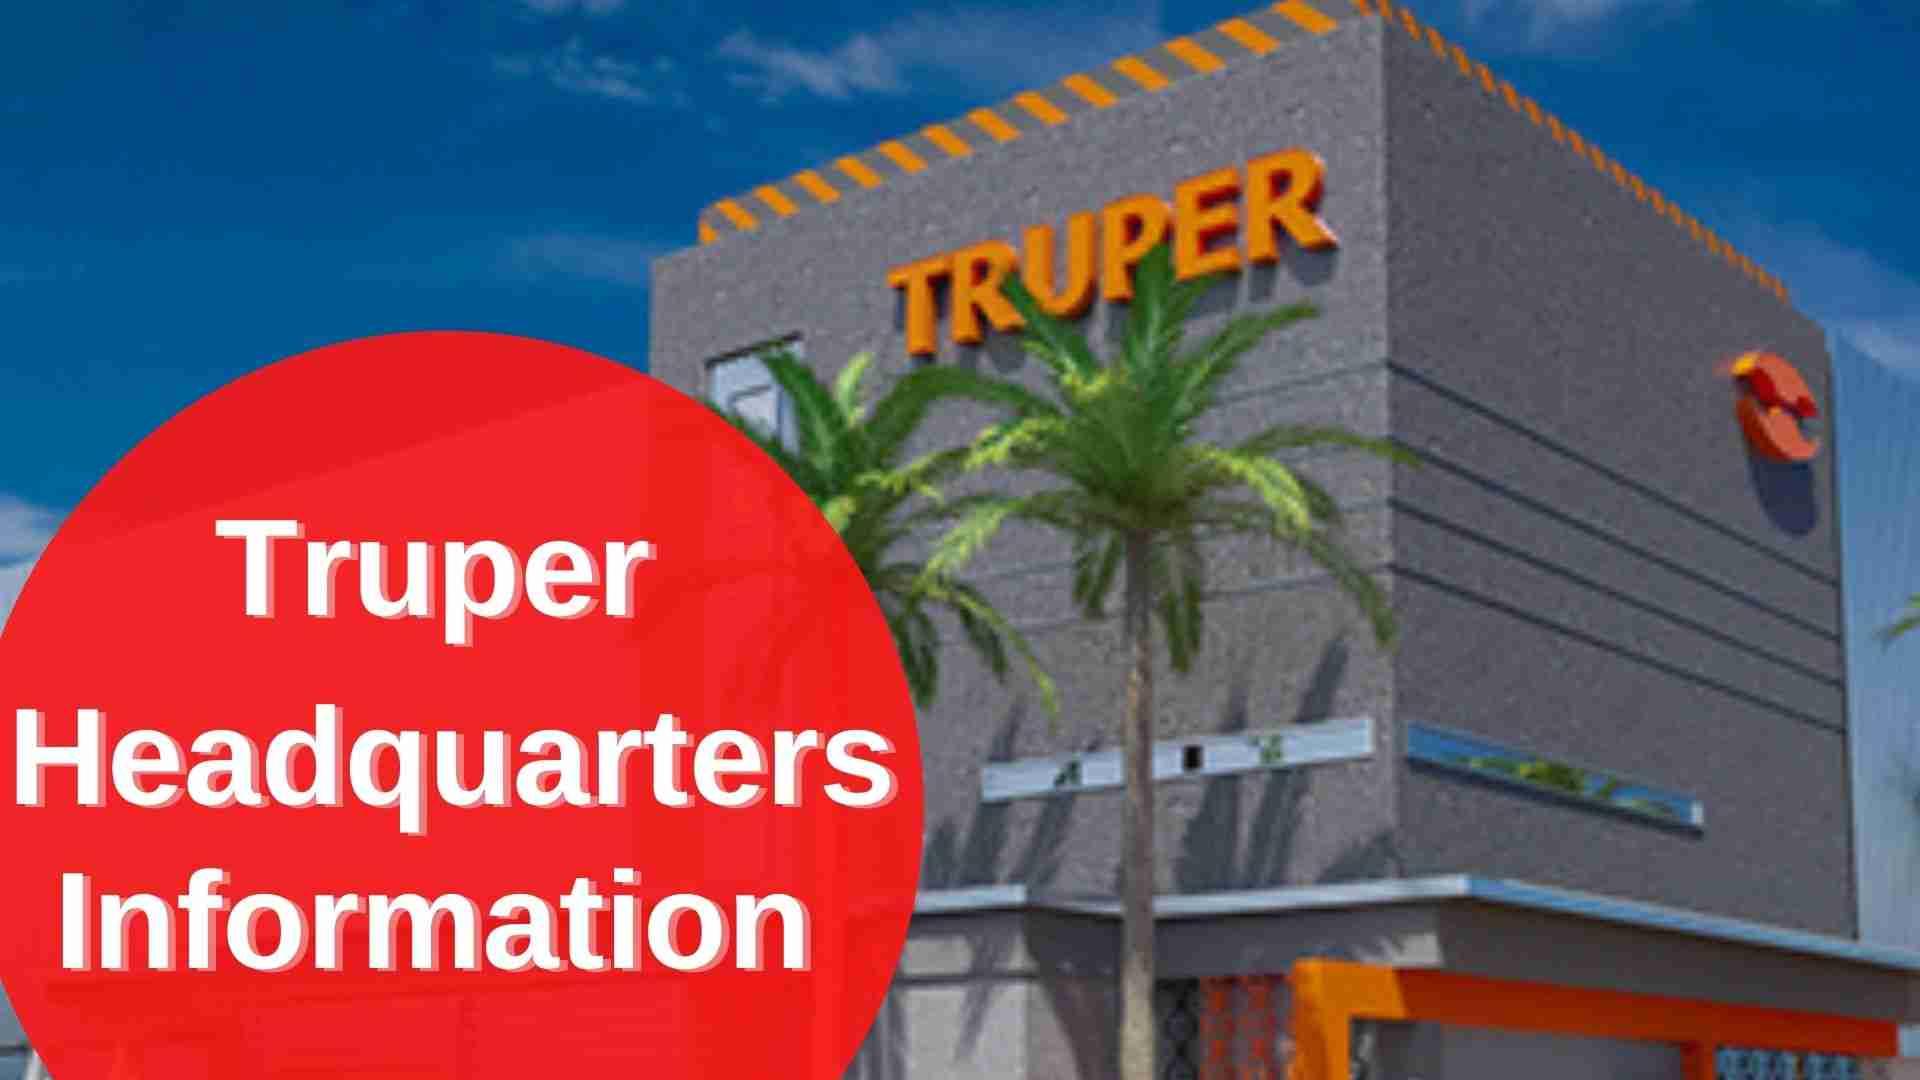 Truper Headquarters Information